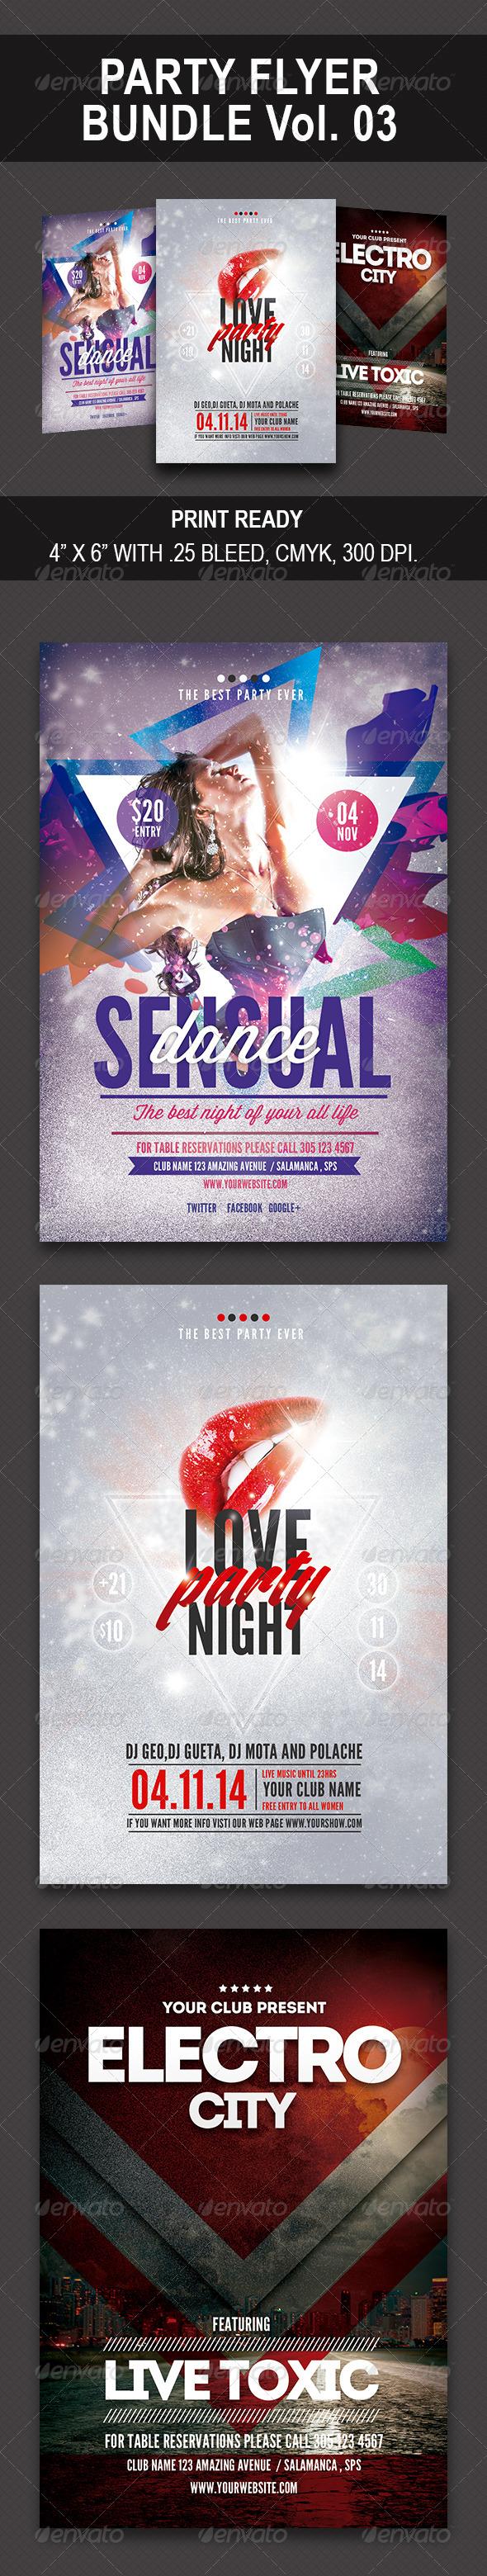 GraphicRiver Party Flyer Bundle Vol 03 8302369